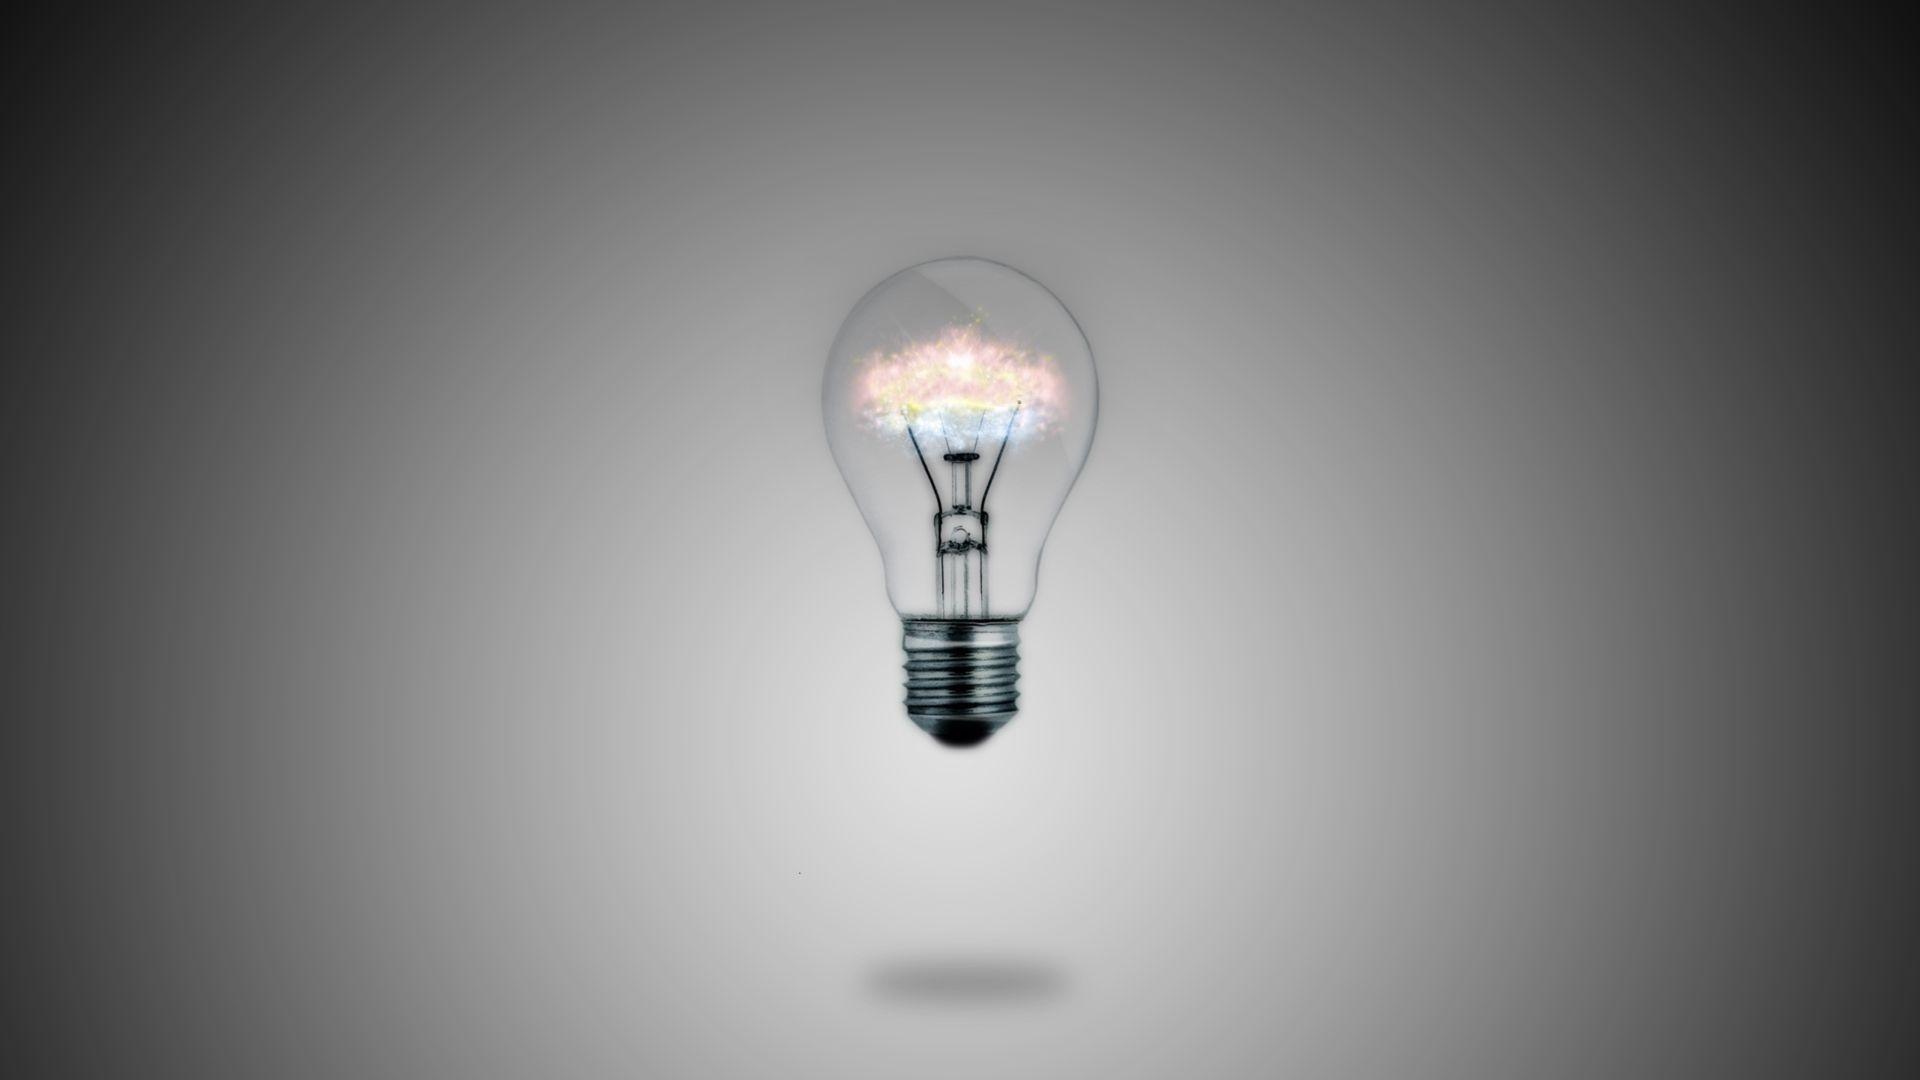 Simple Lamp Wallpaper 53975 1920x1080 Px HDWallSource